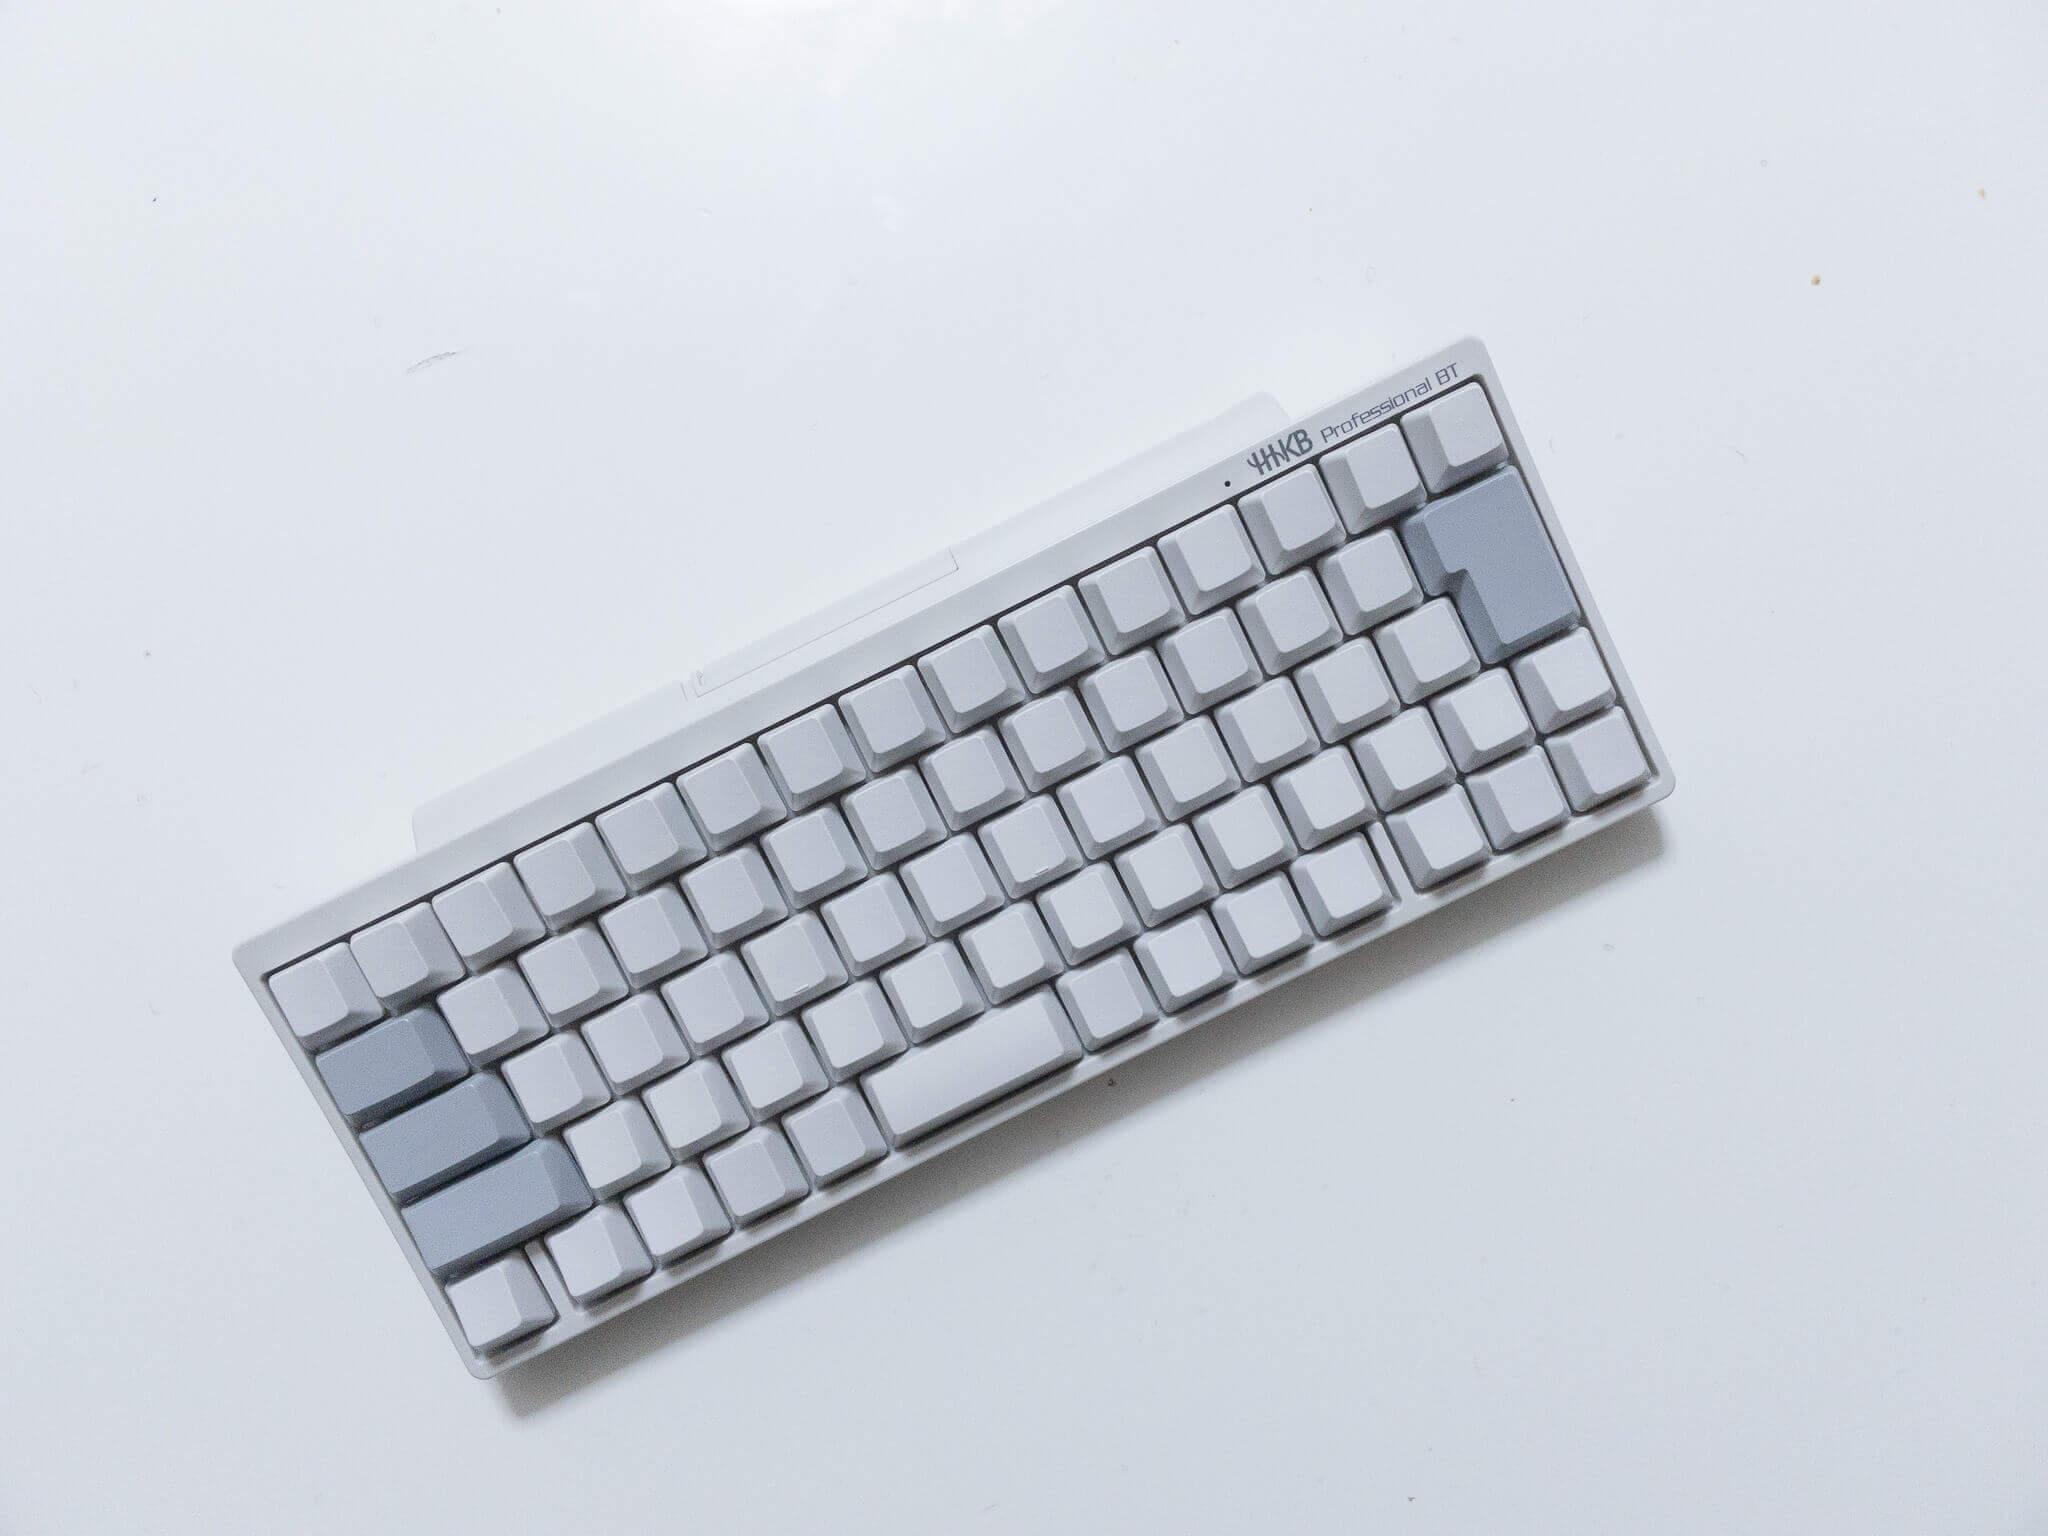 210311 hhkb key no mark 10